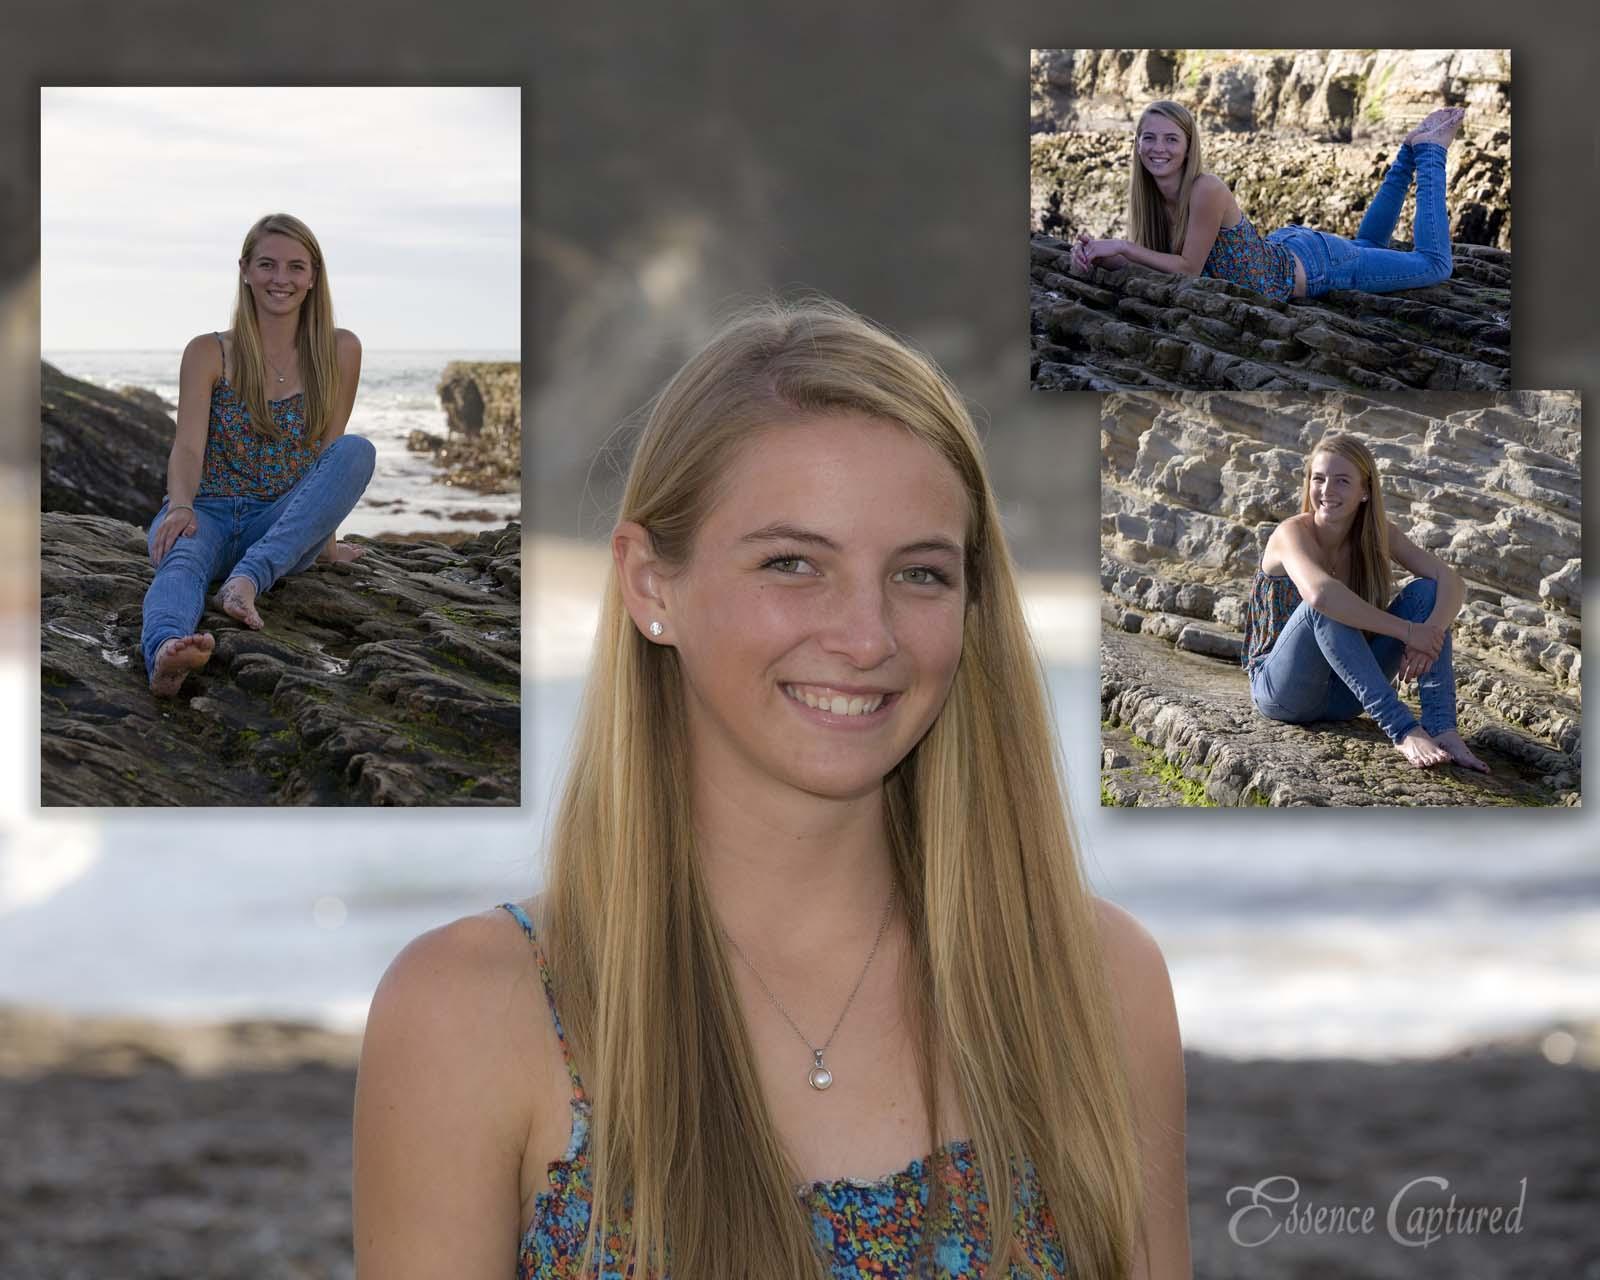 female high school senior portrait long blonde hair beach setting image collage